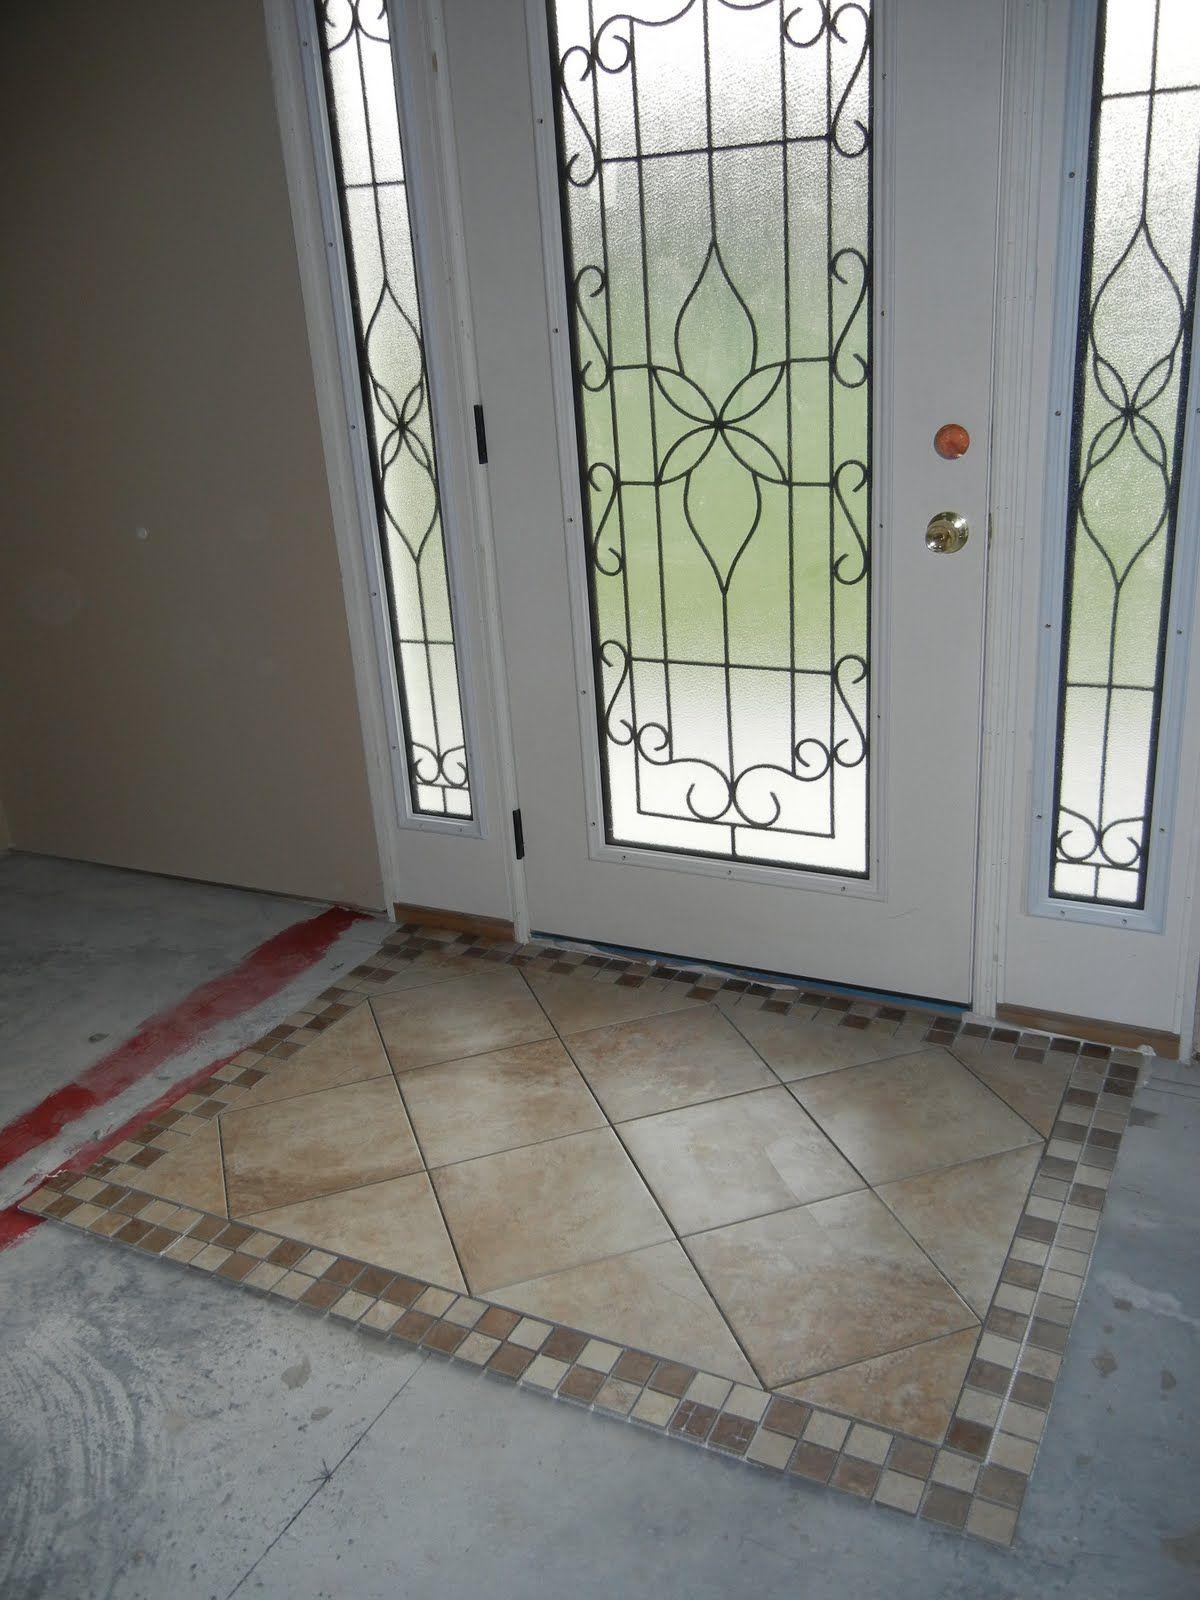 Double Oak Plantation Front Door Foyer Tiled Rug Area